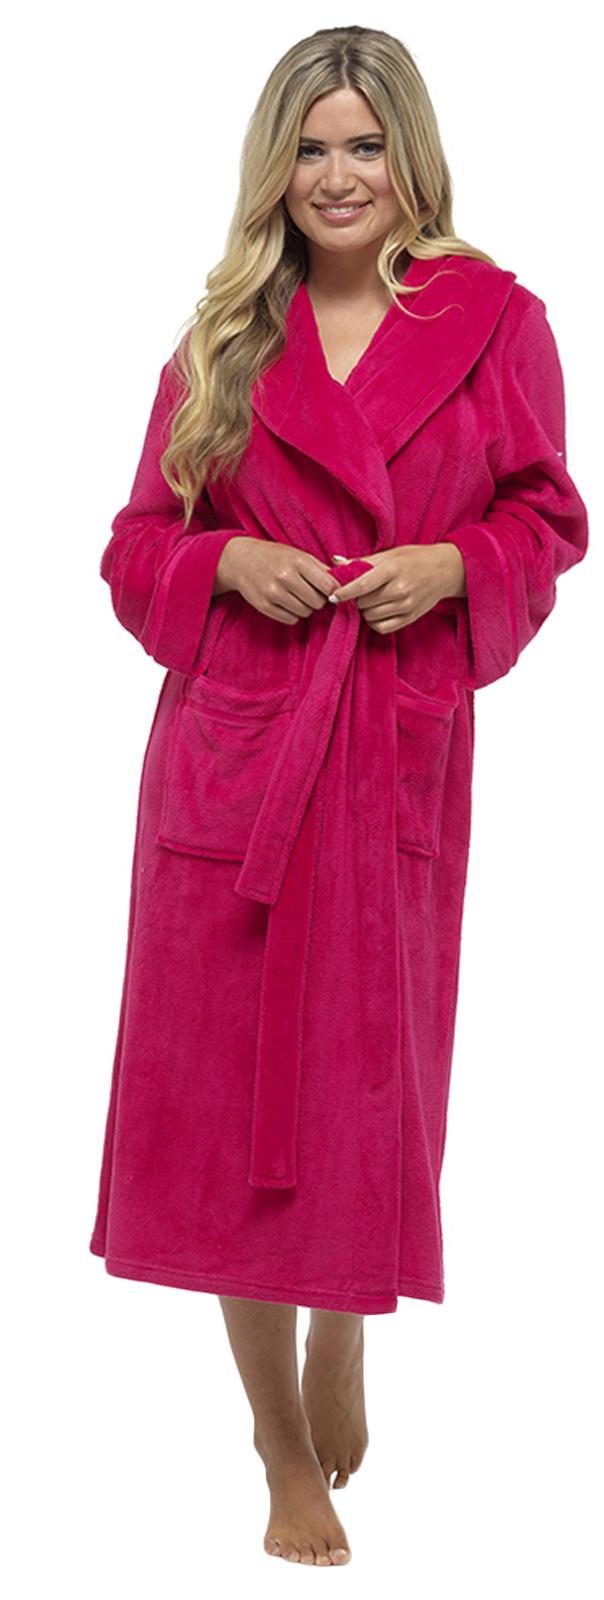 Details about Luxury Womens Full Length Fleece Dressing Gown Long Warm Winter Bath Robe Size